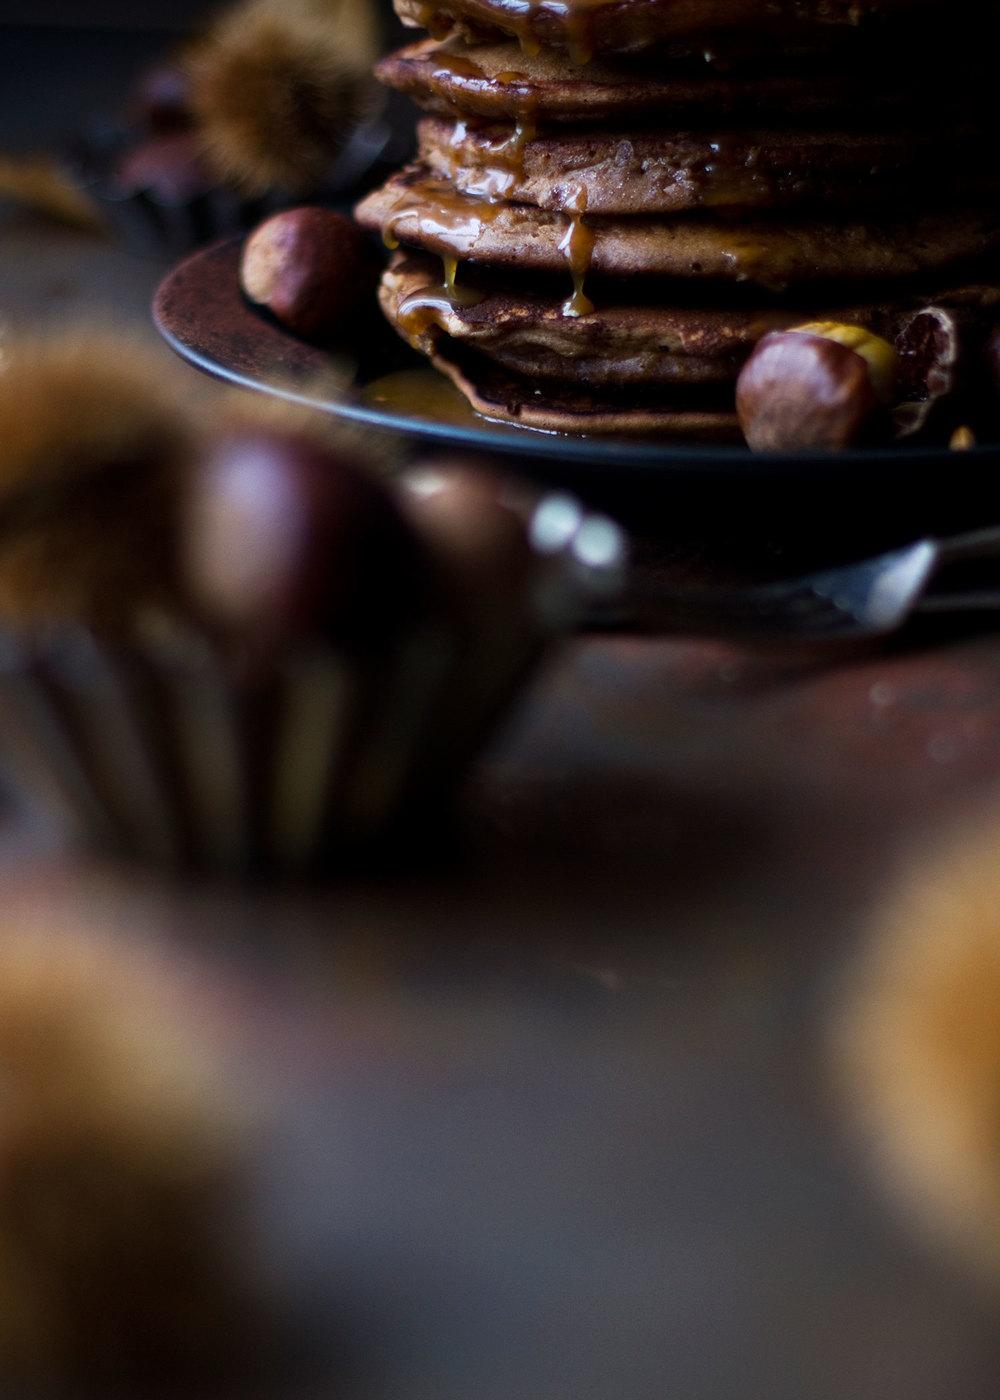 05_NOMNOM_SI_Maroni_Pancakes.jpg